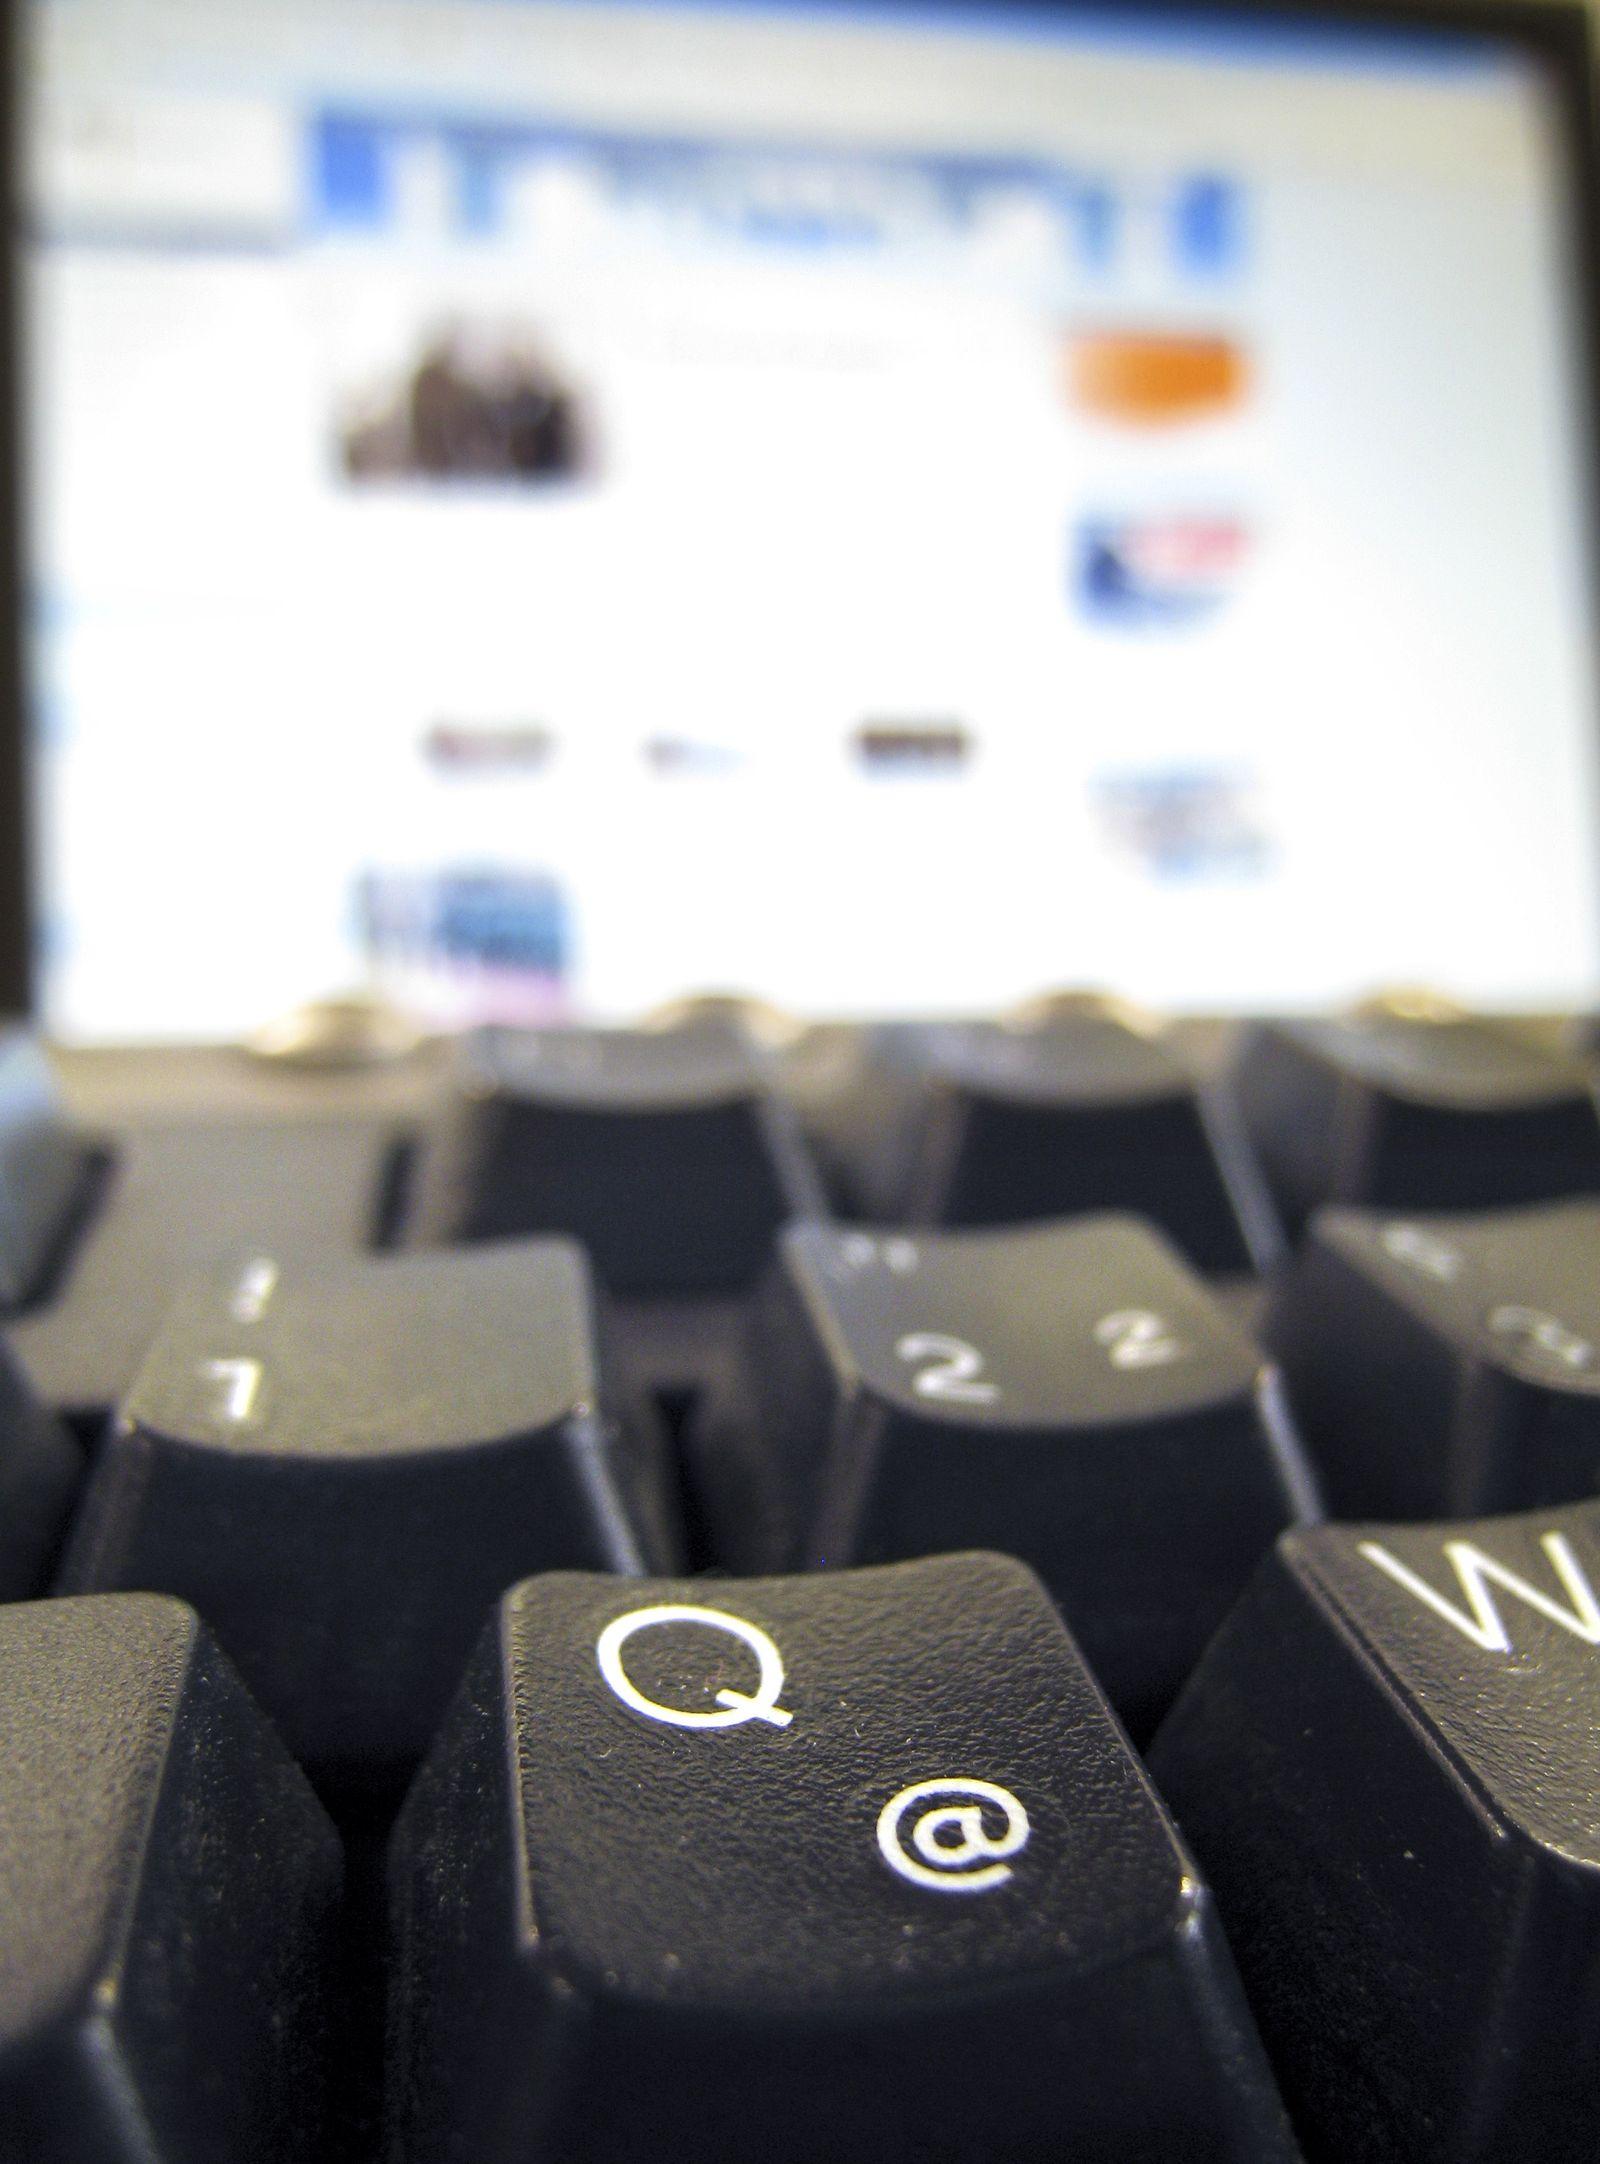 DEU TERROR COMPUTER VERFASSUNGSGERICHT